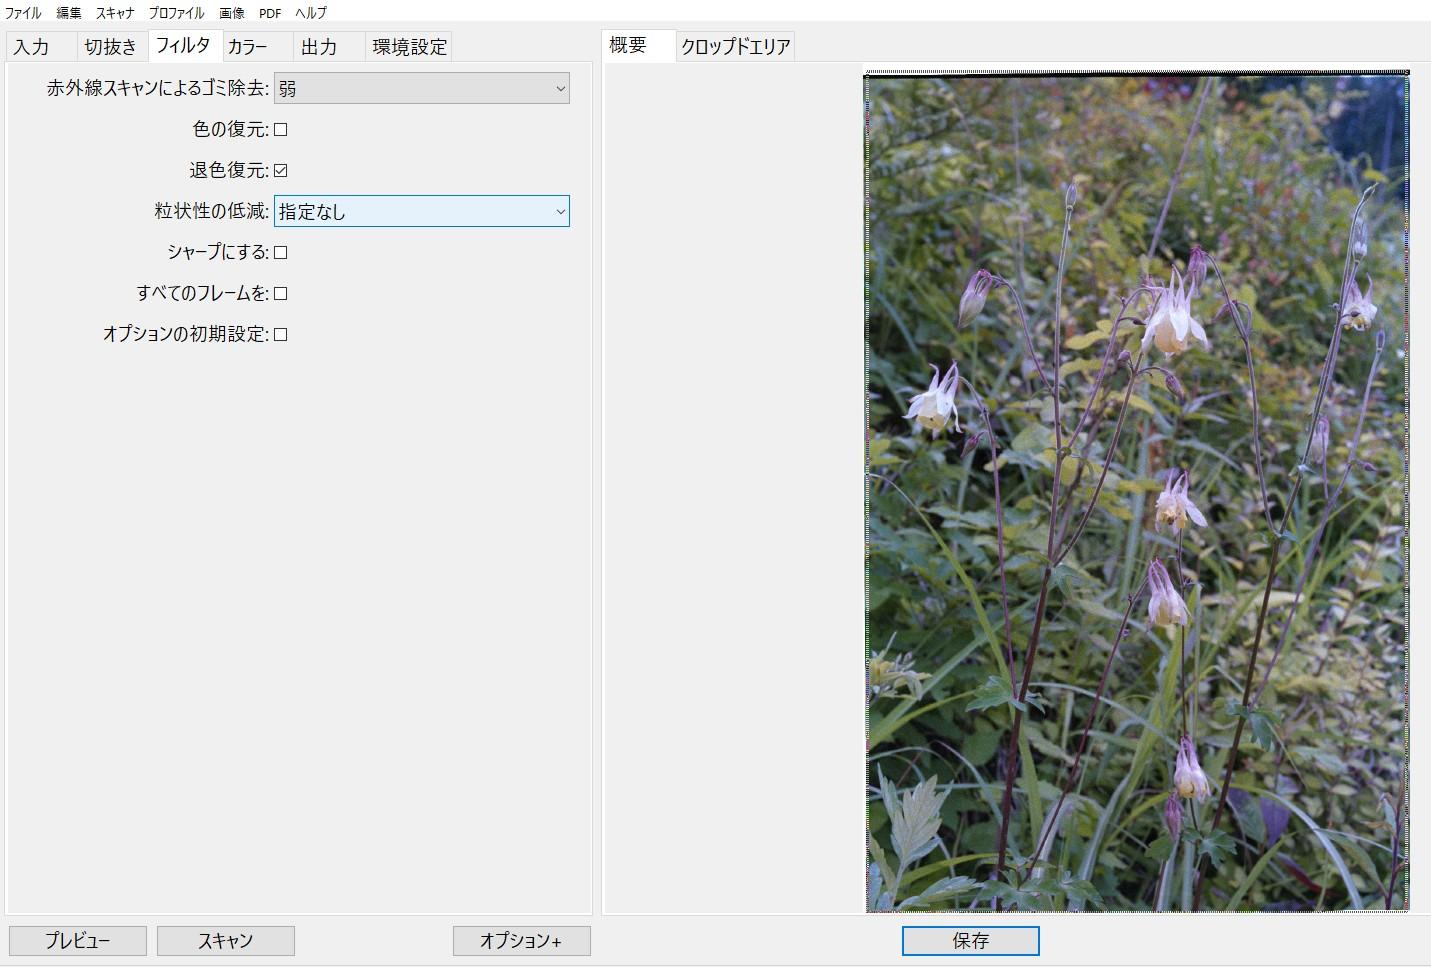 f:id:yasuo_ssi:20200824234826j:plain